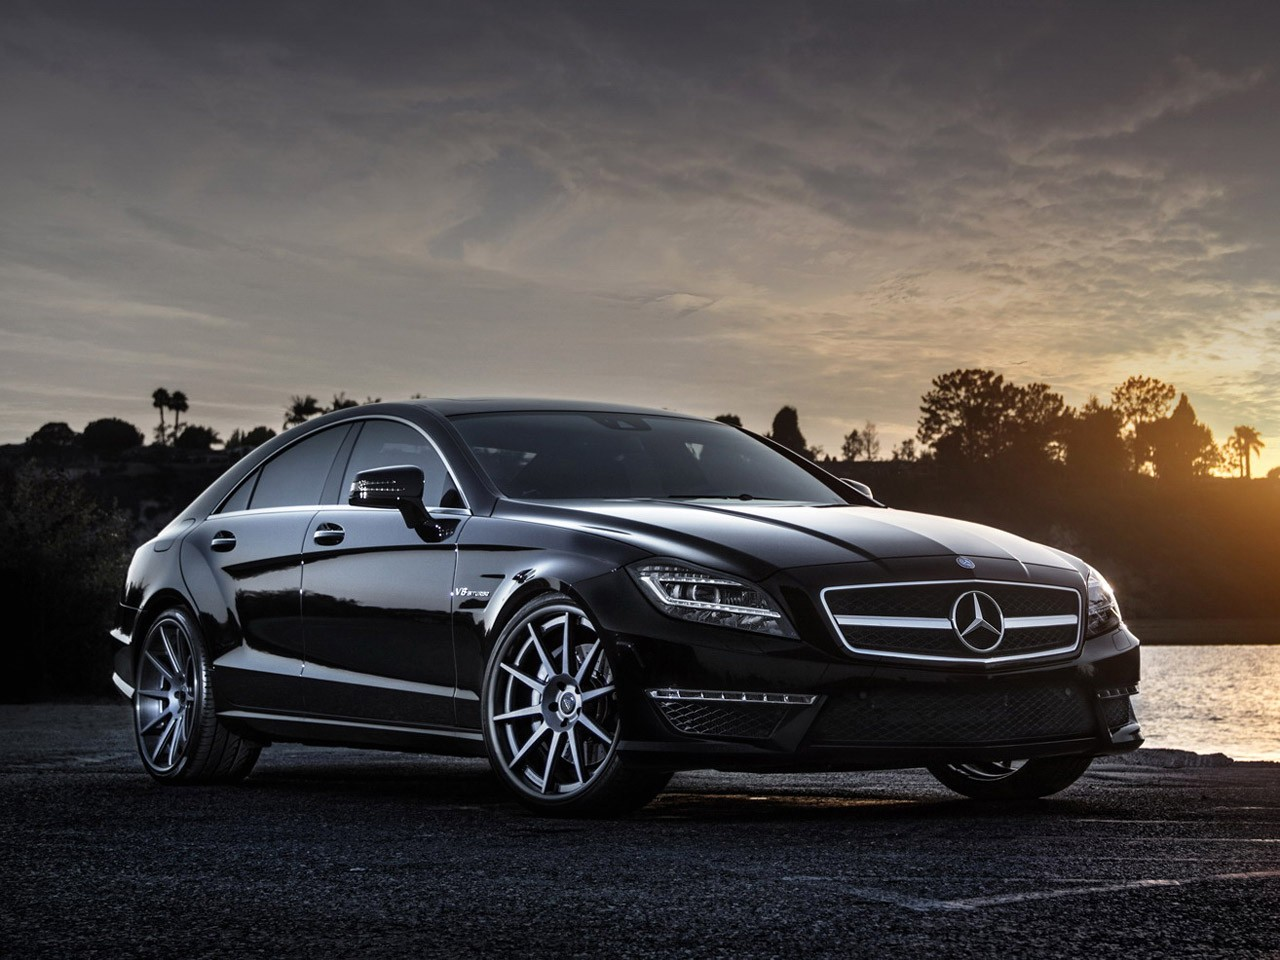 2012 Vorsteiner - Mercedes CLS VS 360